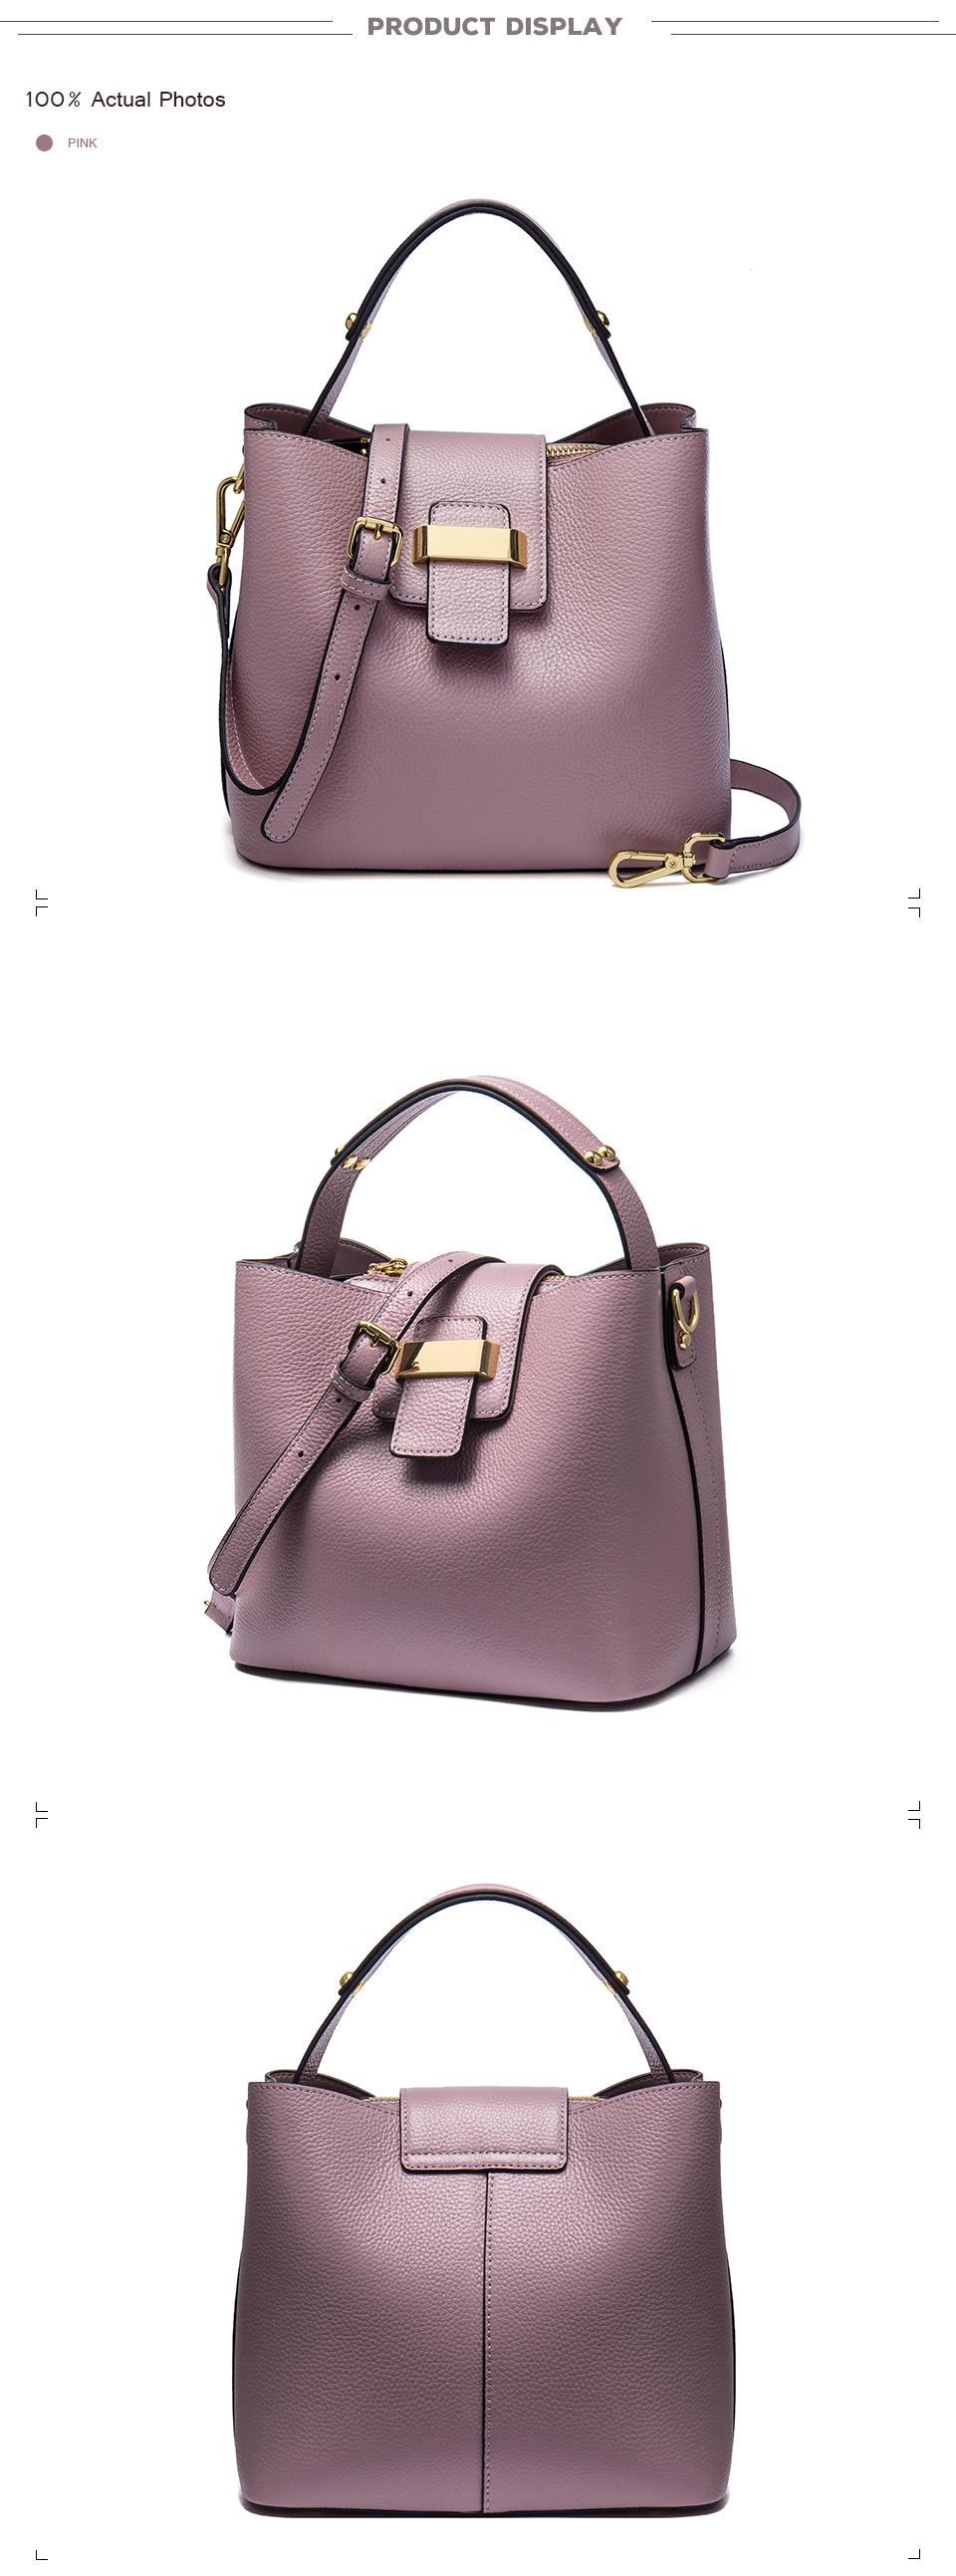 0fcc5570e156 NAWO 2017 Designer Women Leather Handbags Bucket Shoulder Bags ...